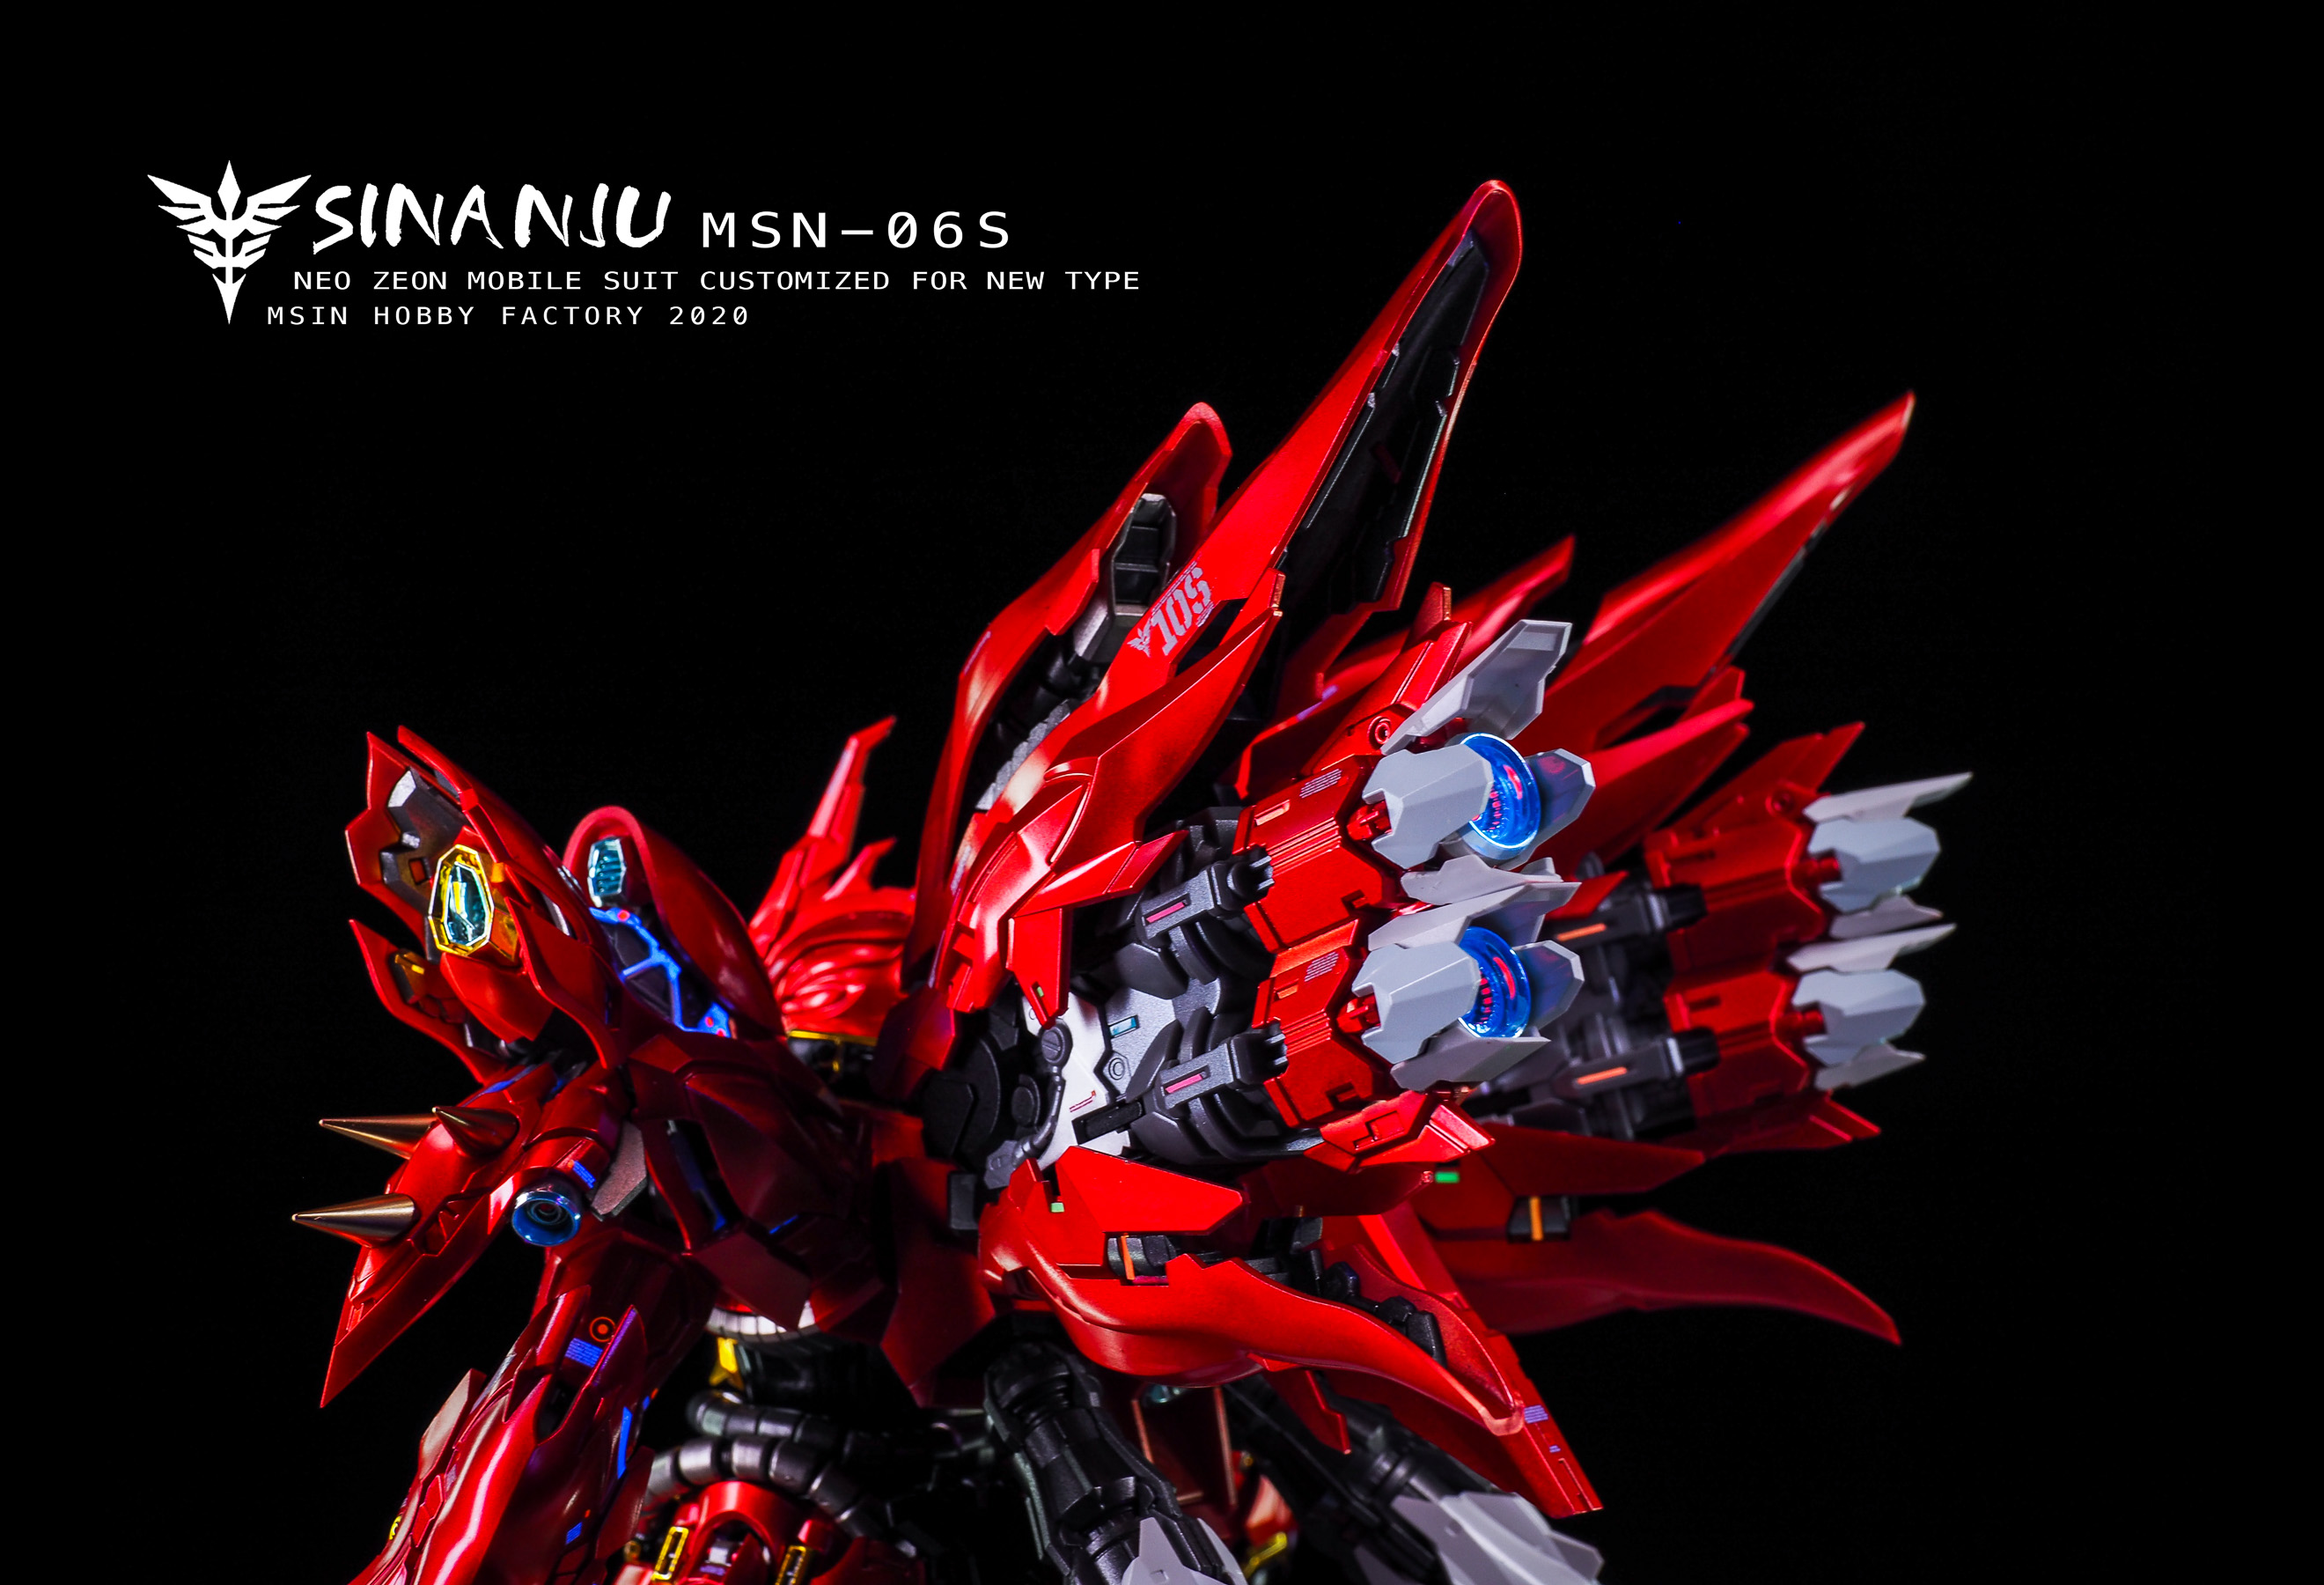 S437_6_takumi_sinanju_red_005.jpg